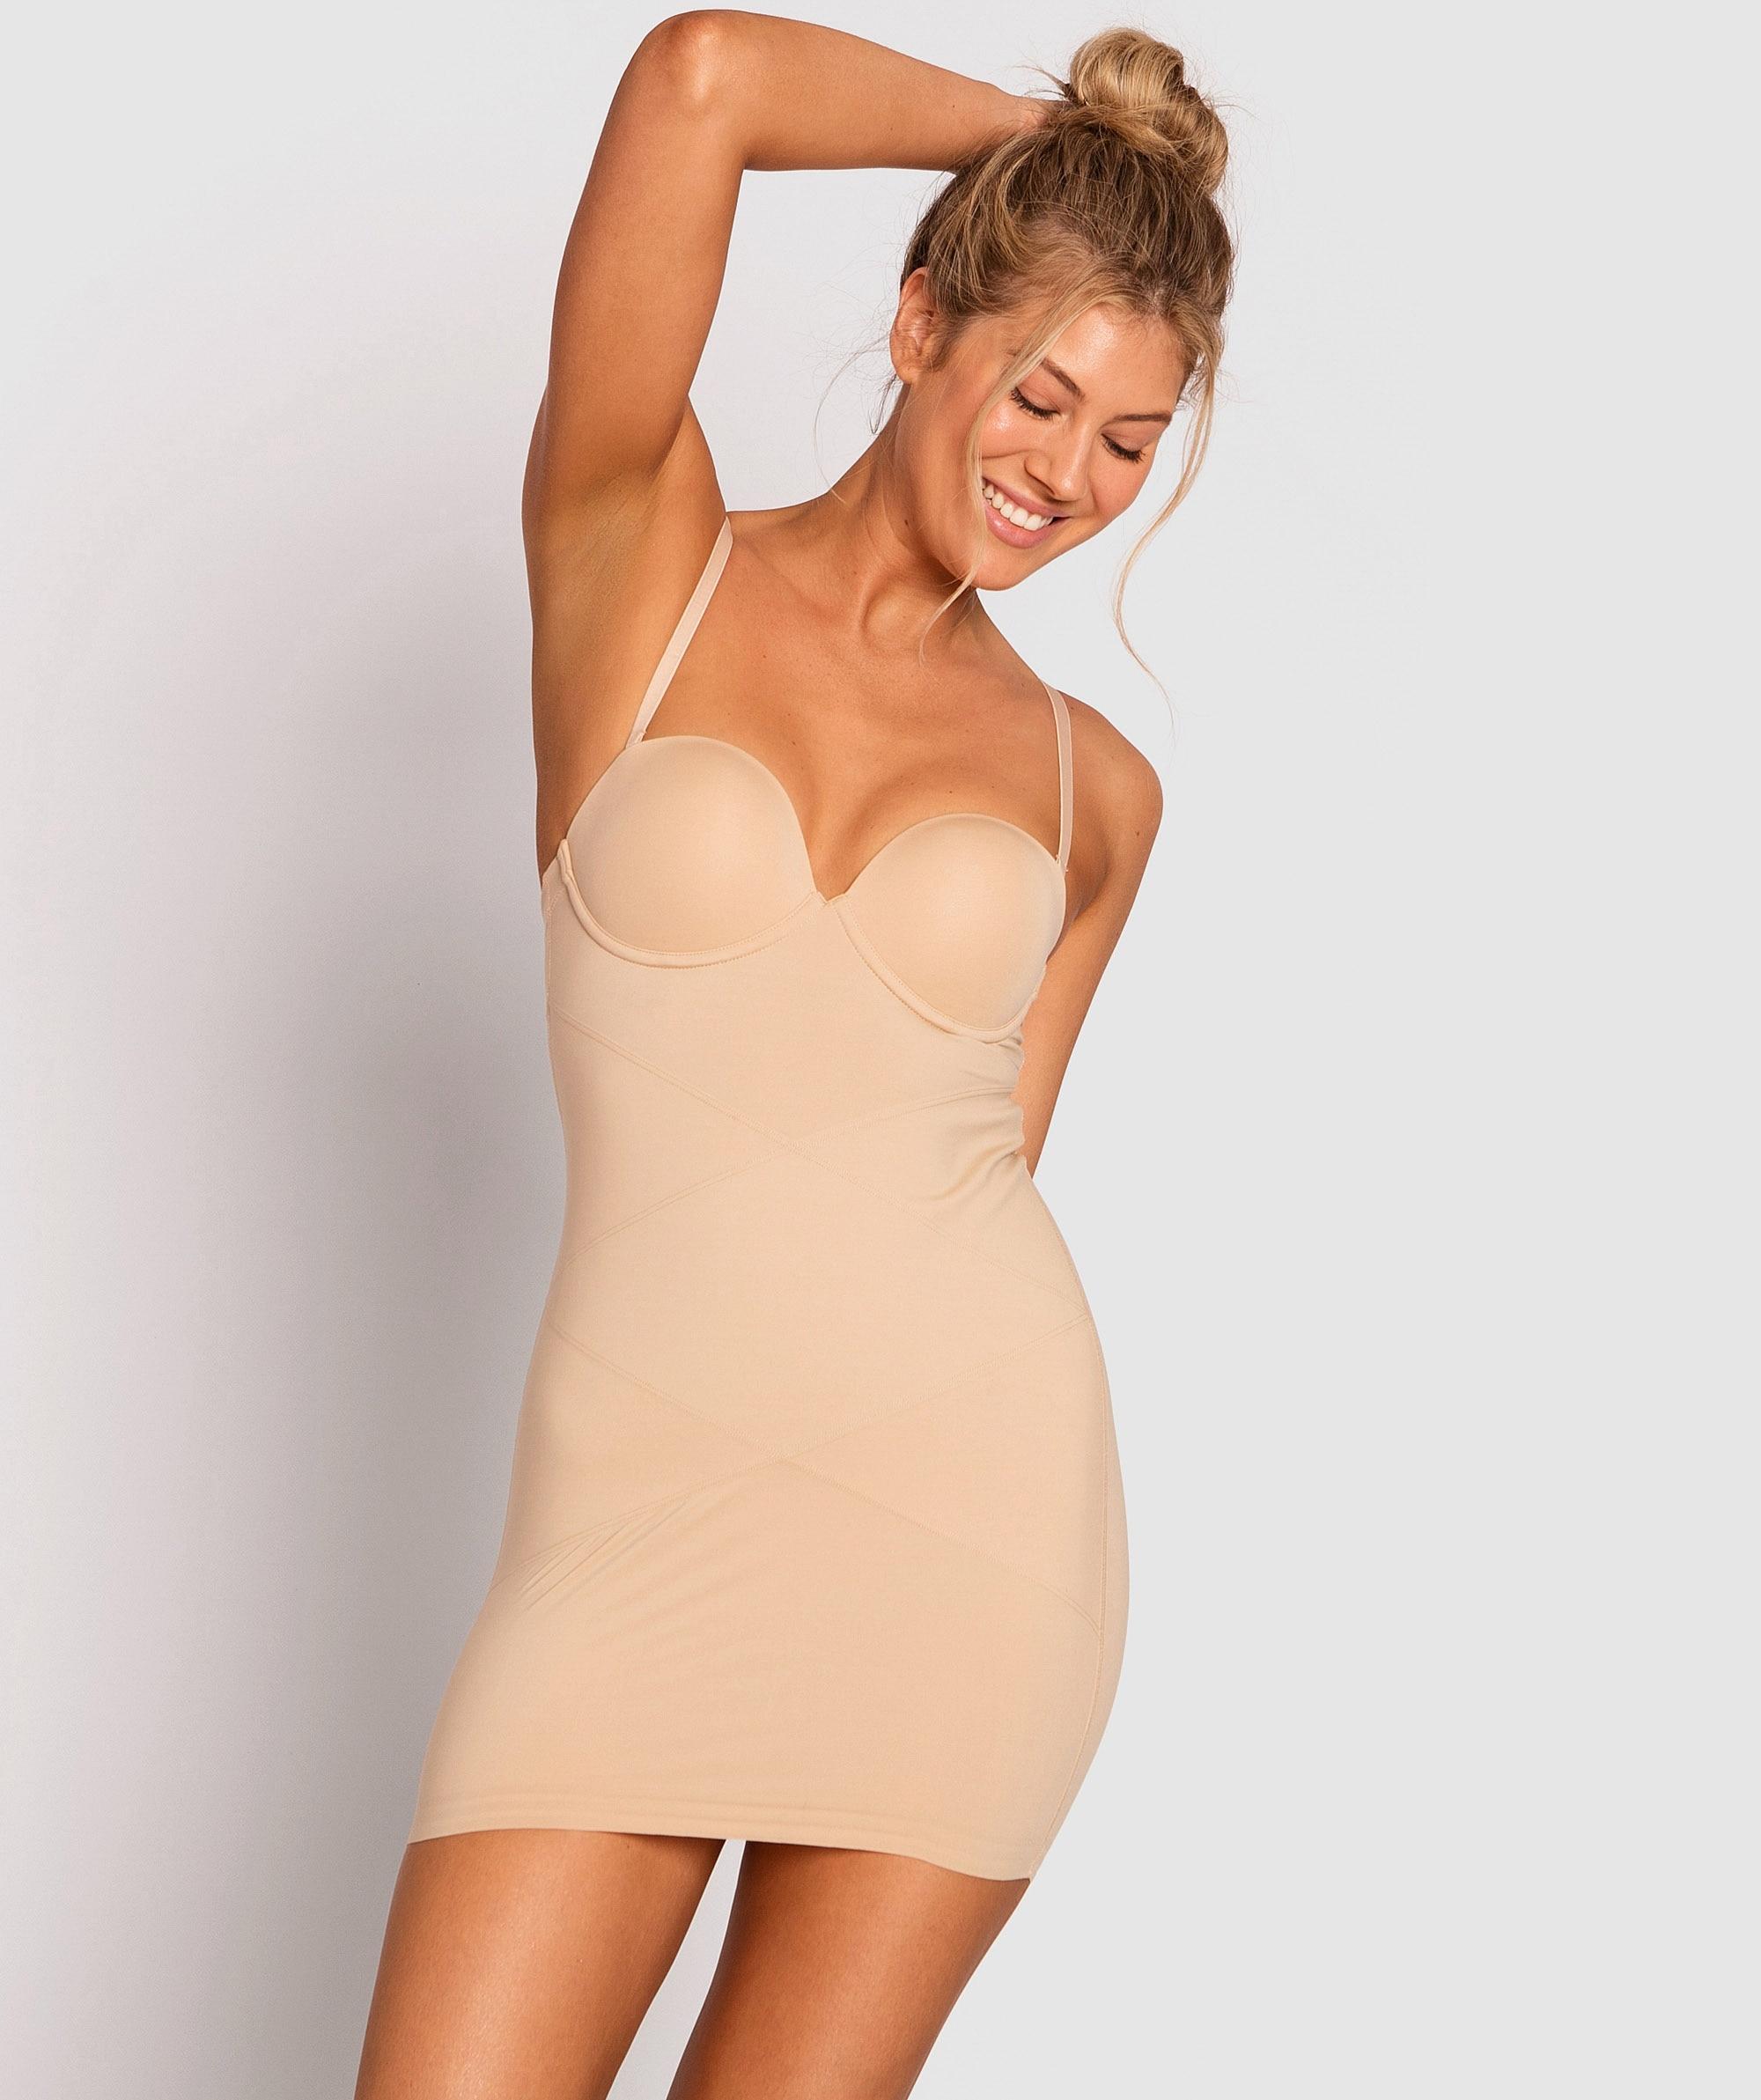 Body Basic Strapless Slip - Nude